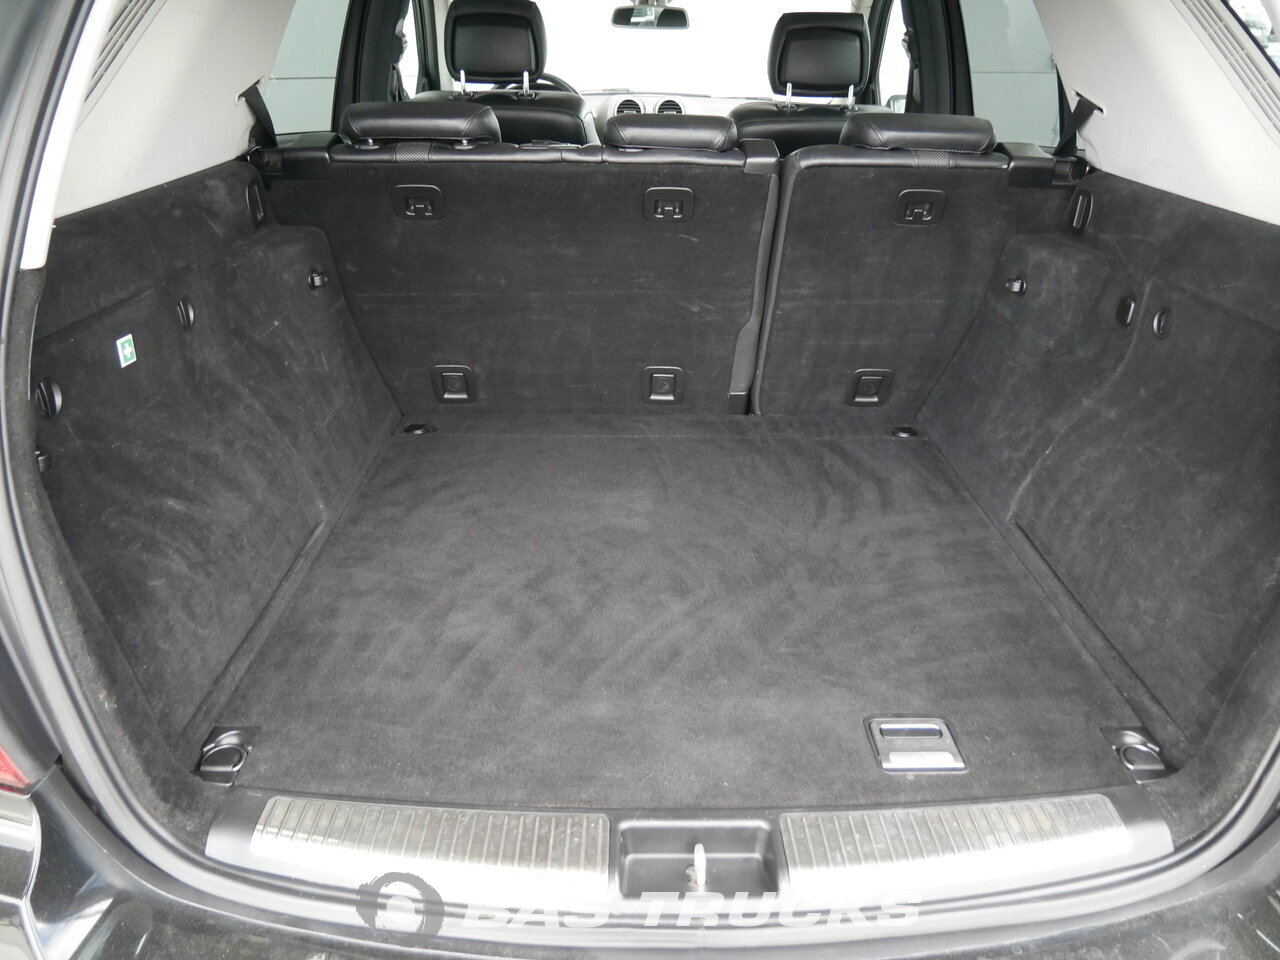 mercedes ml 280 cdi 4matic voiture euro 0 9500 bas trucks. Black Bedroom Furniture Sets. Home Design Ideas